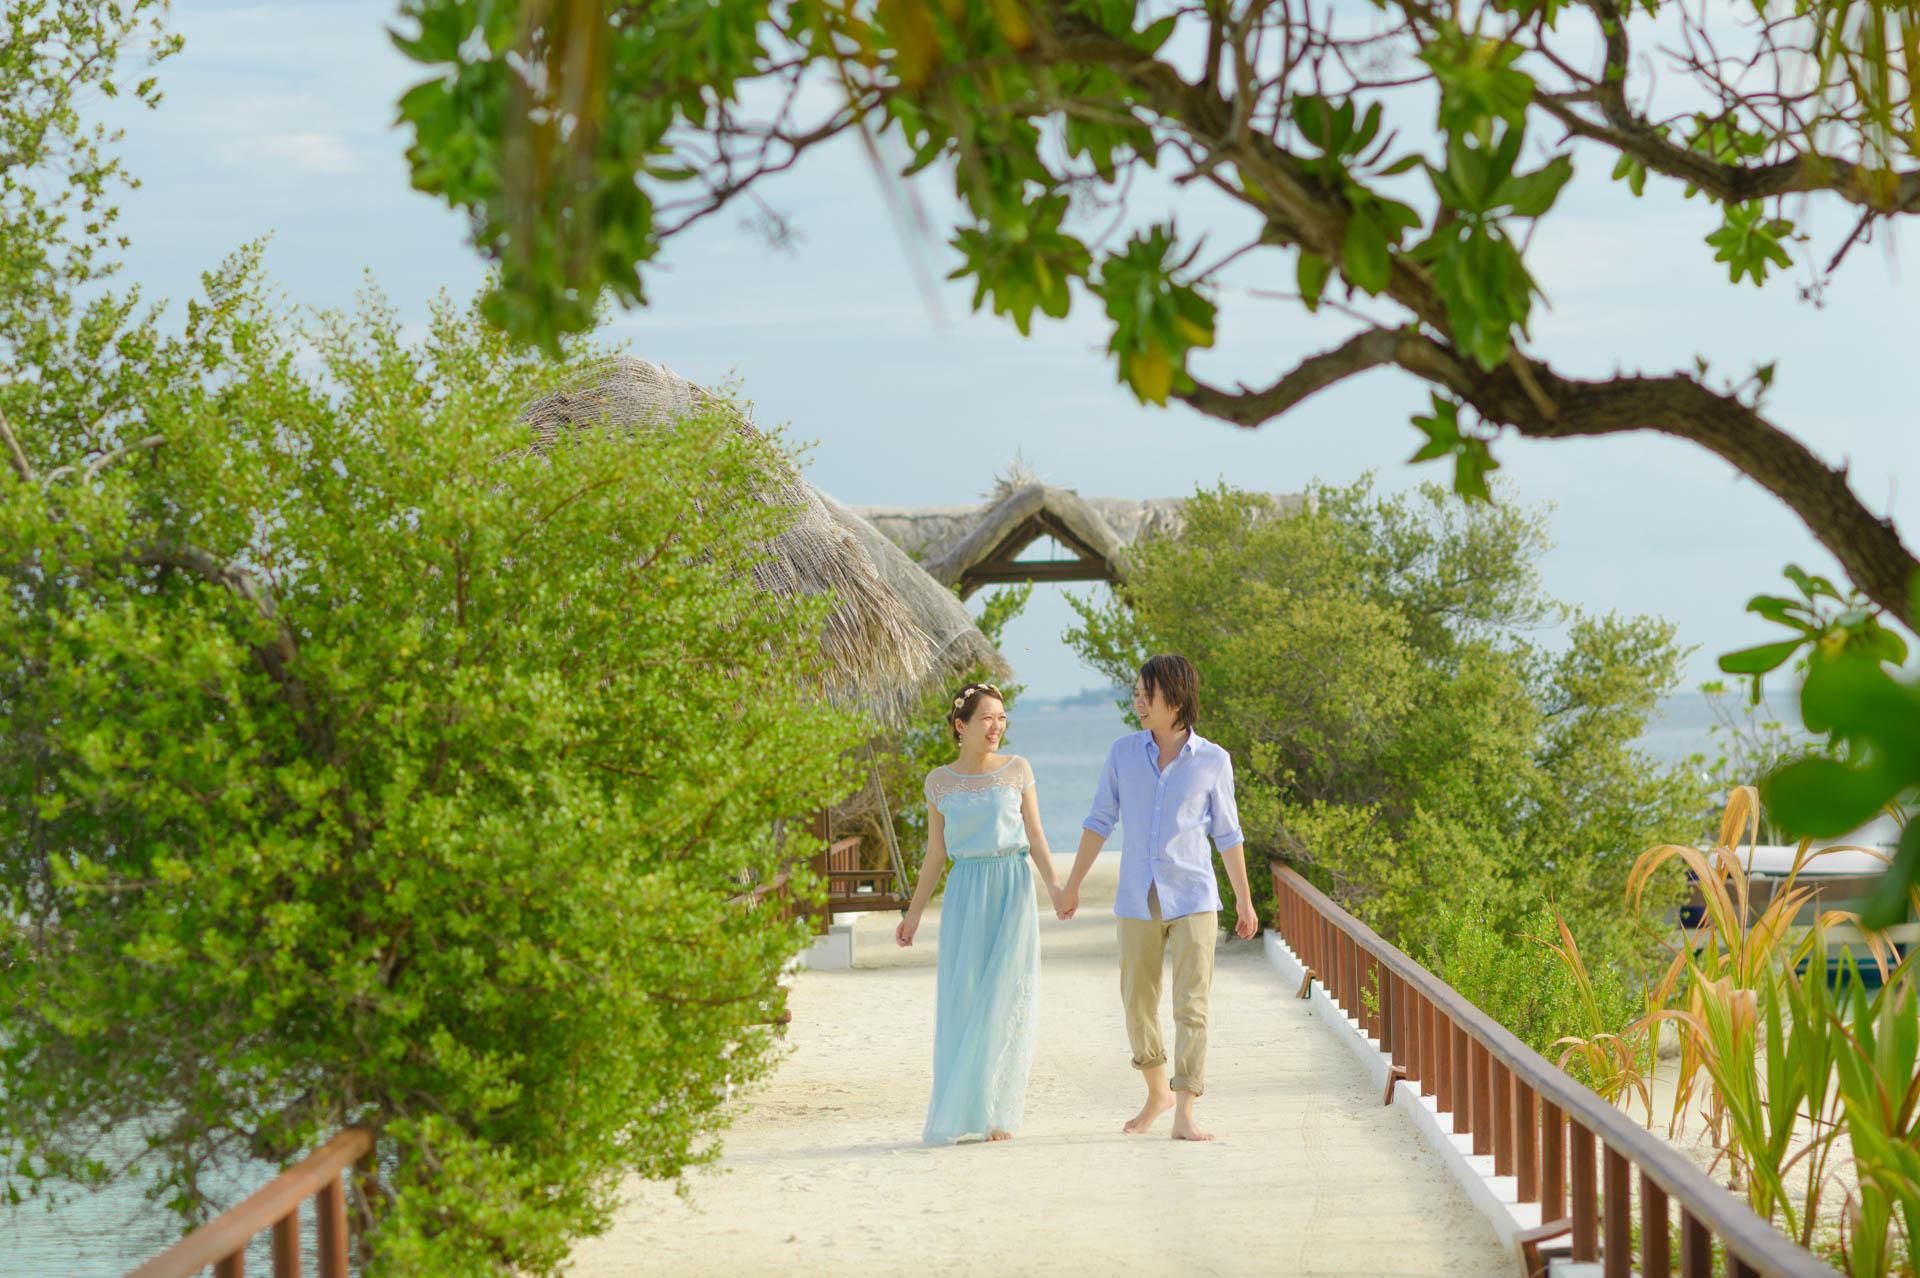 Devin and Natsuko Honeymoon at Makunudhoo Island Maldives 25